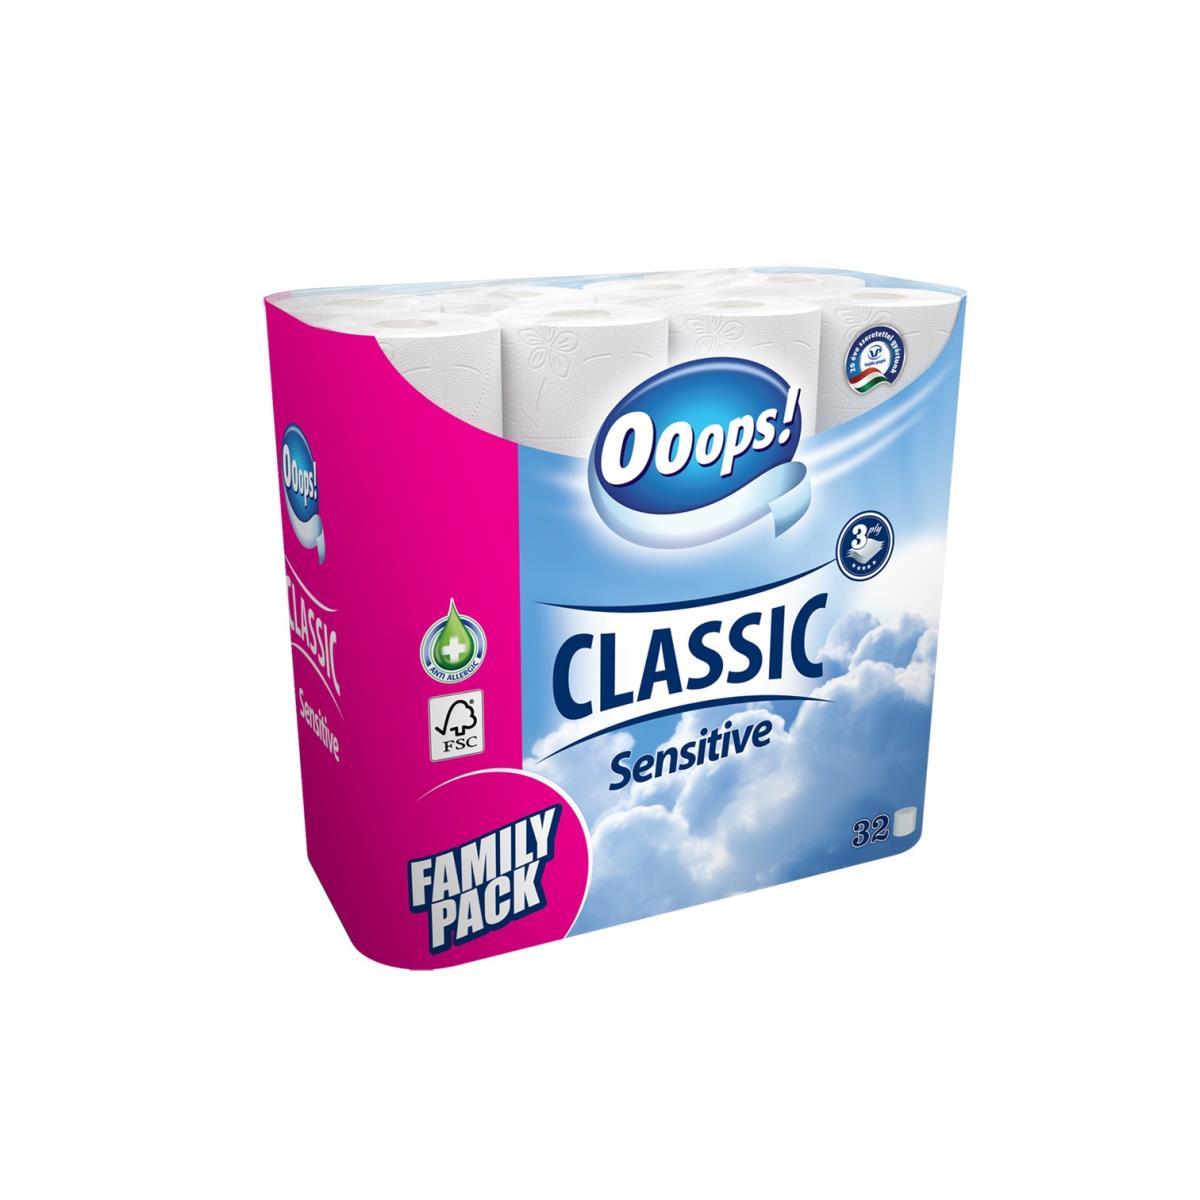 Toilettenpapier 32 Rollen 3 Lagig 125 Blatt Toilette Papier FamilyPack Ooops!,Ooops!,000040036793, 5998648704341